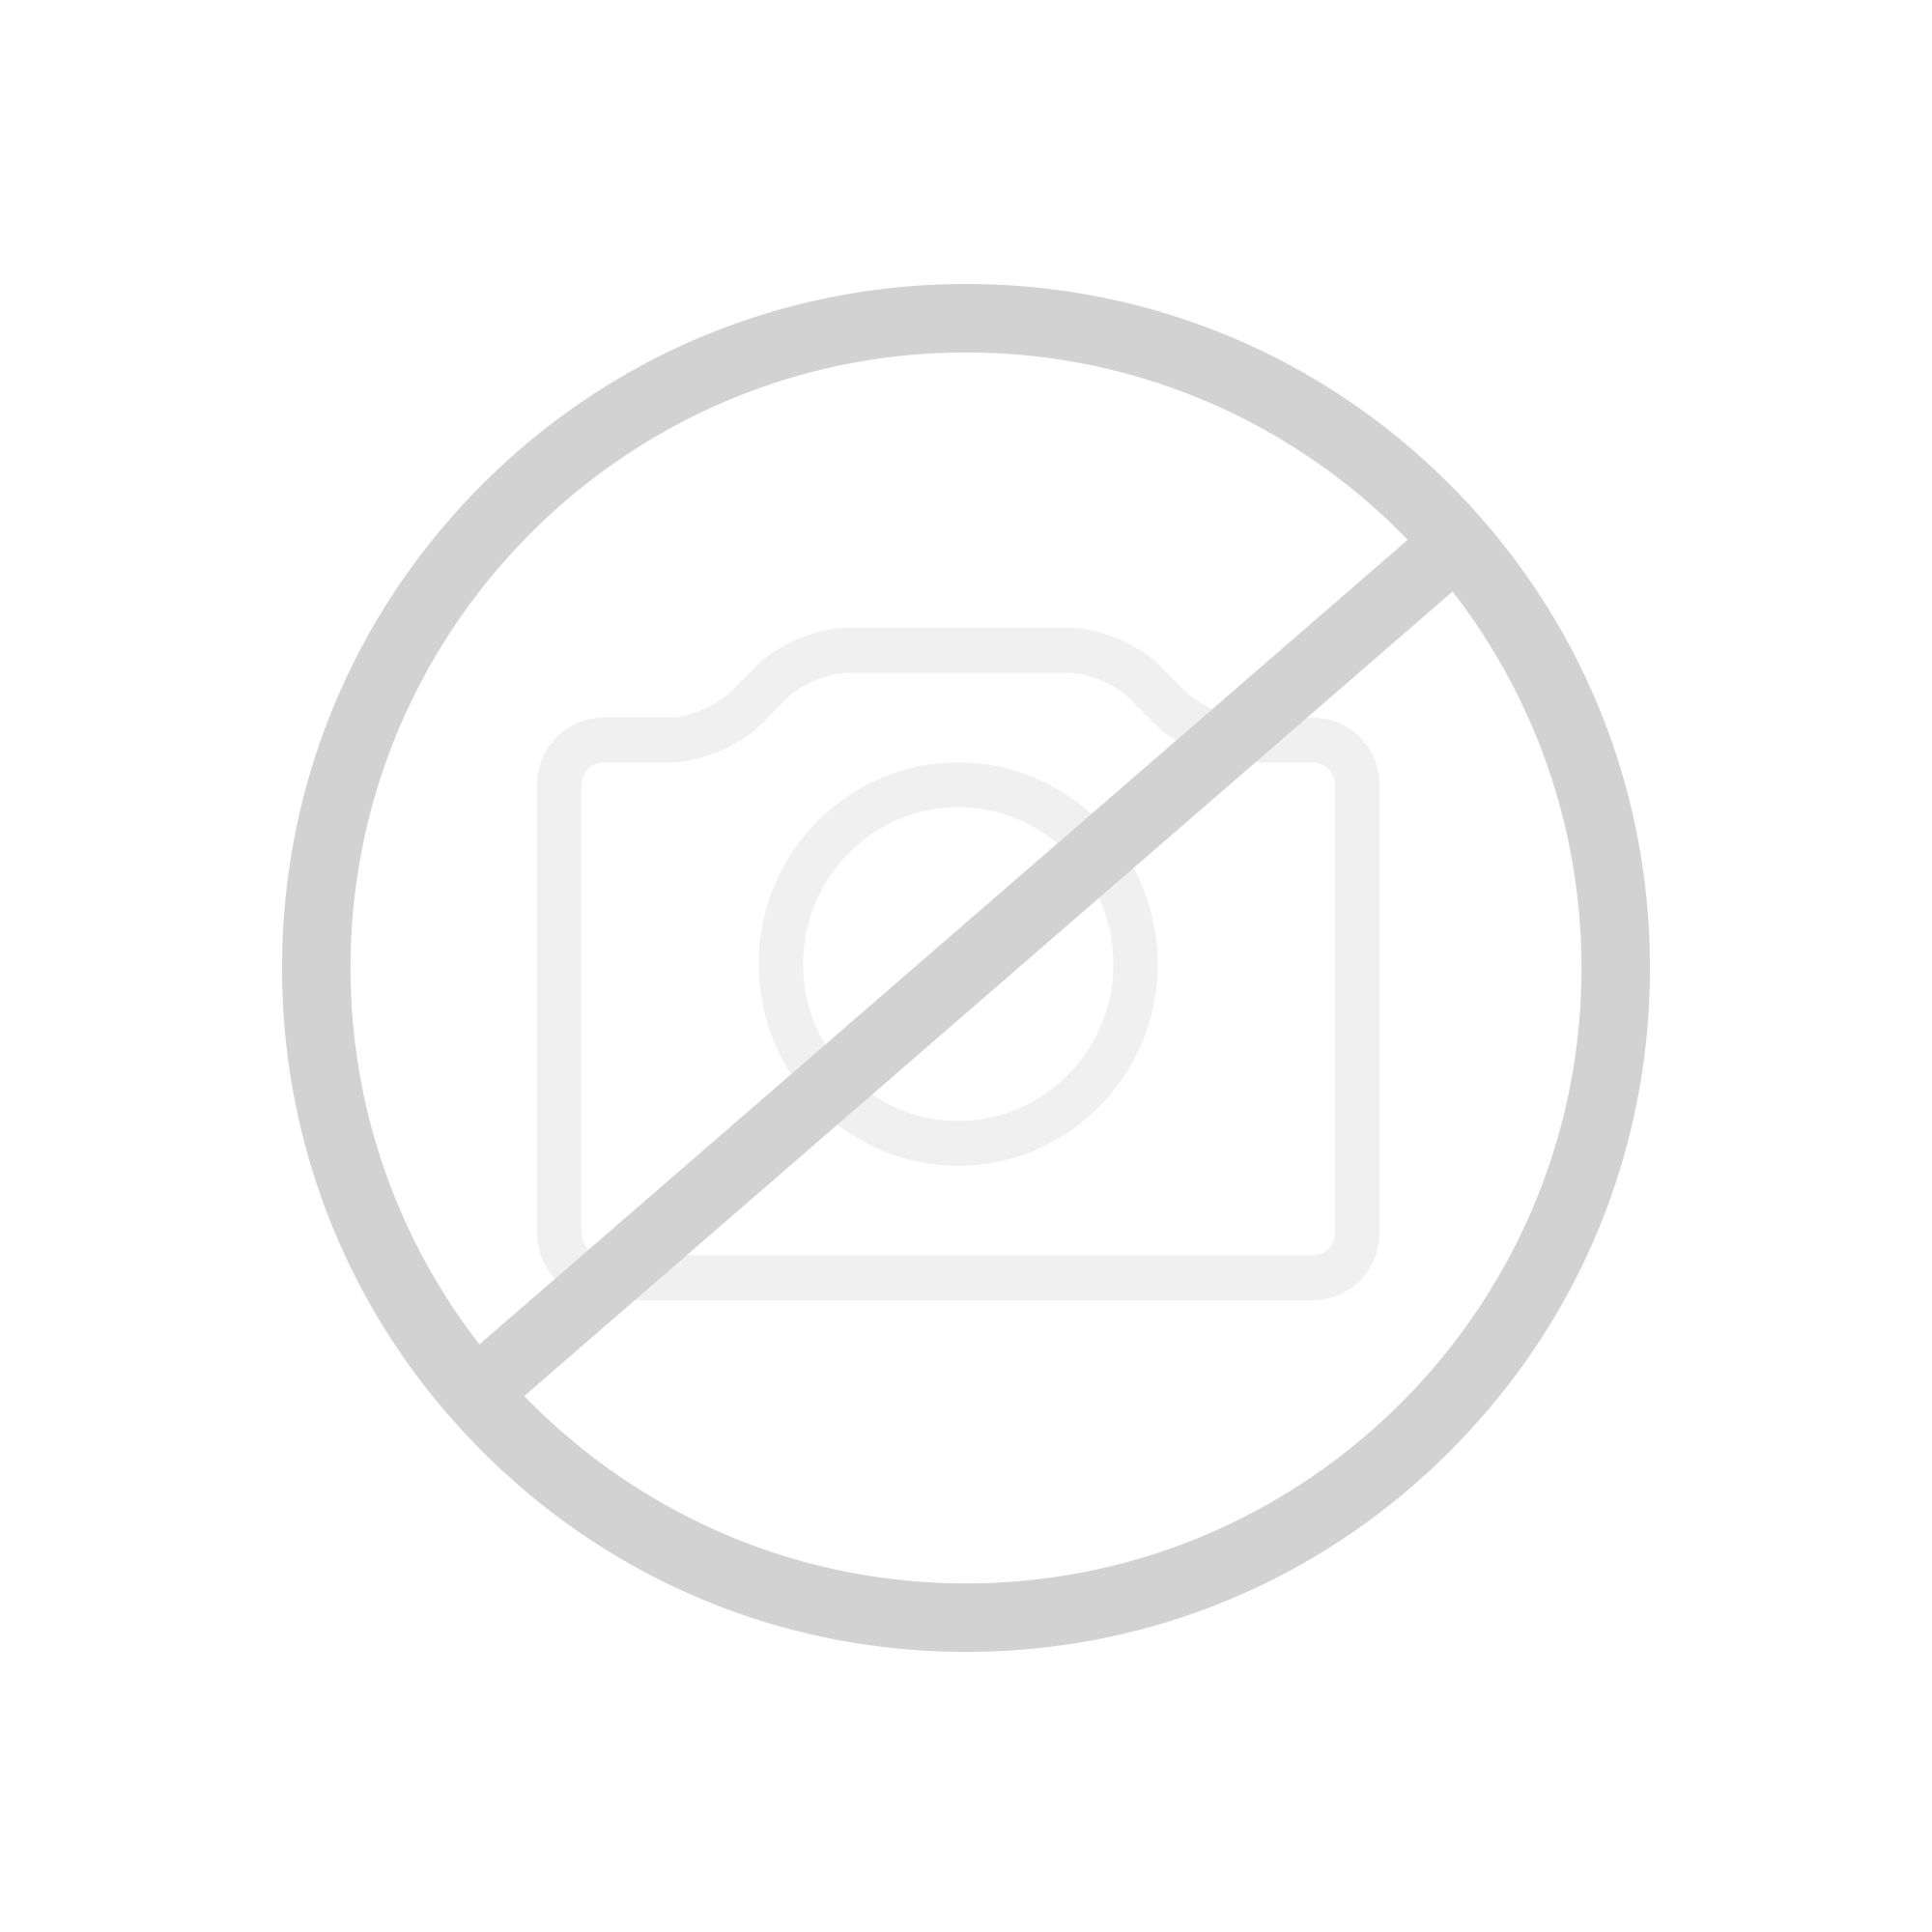 geberit designplatte f r aquaclean sela und aquaclean mera up sp lkasten wei 115329111. Black Bedroom Furniture Sets. Home Design Ideas